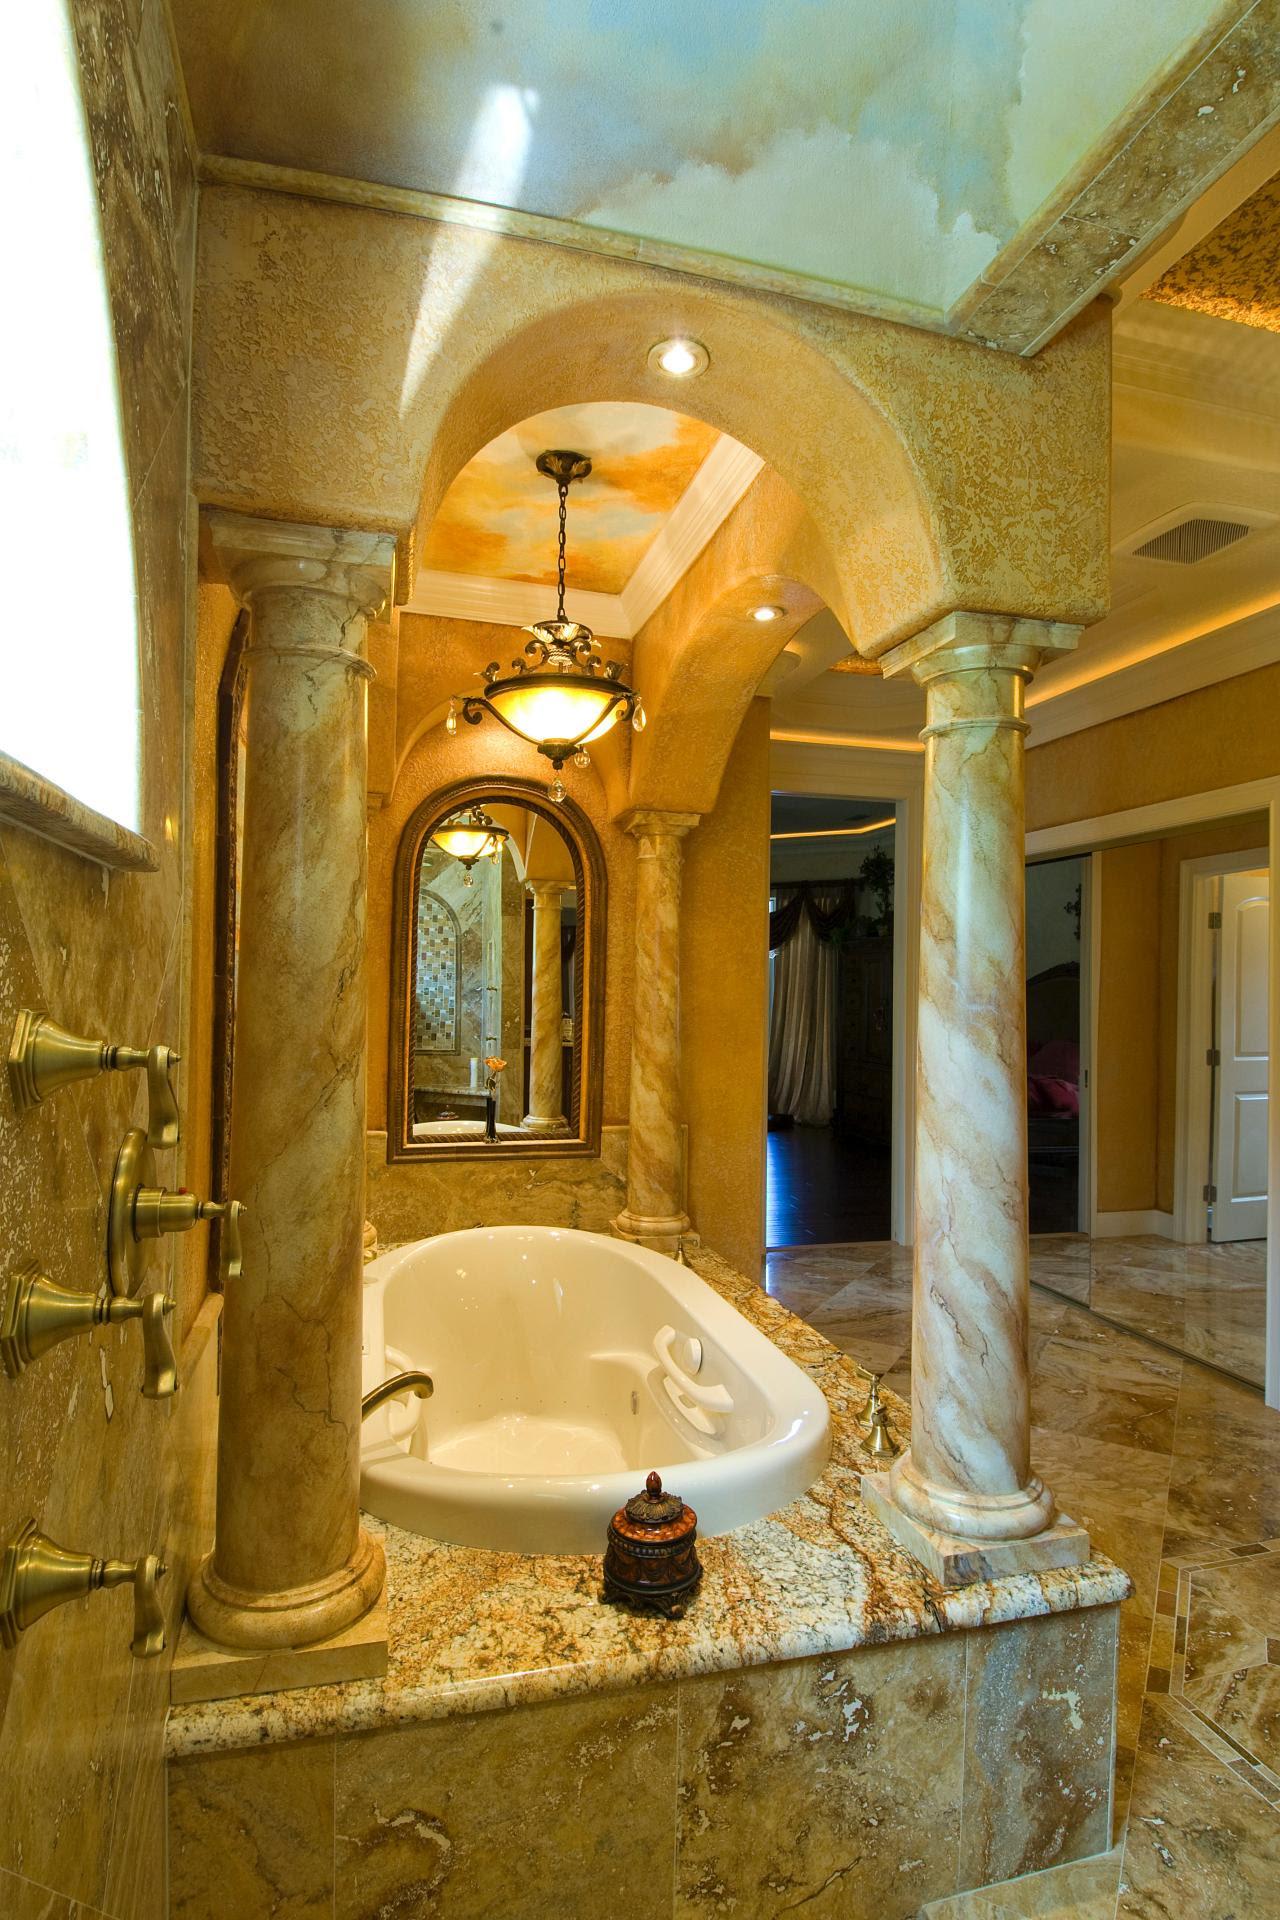 25 Tuscan Bathroom Design Ideas - Decoration Love